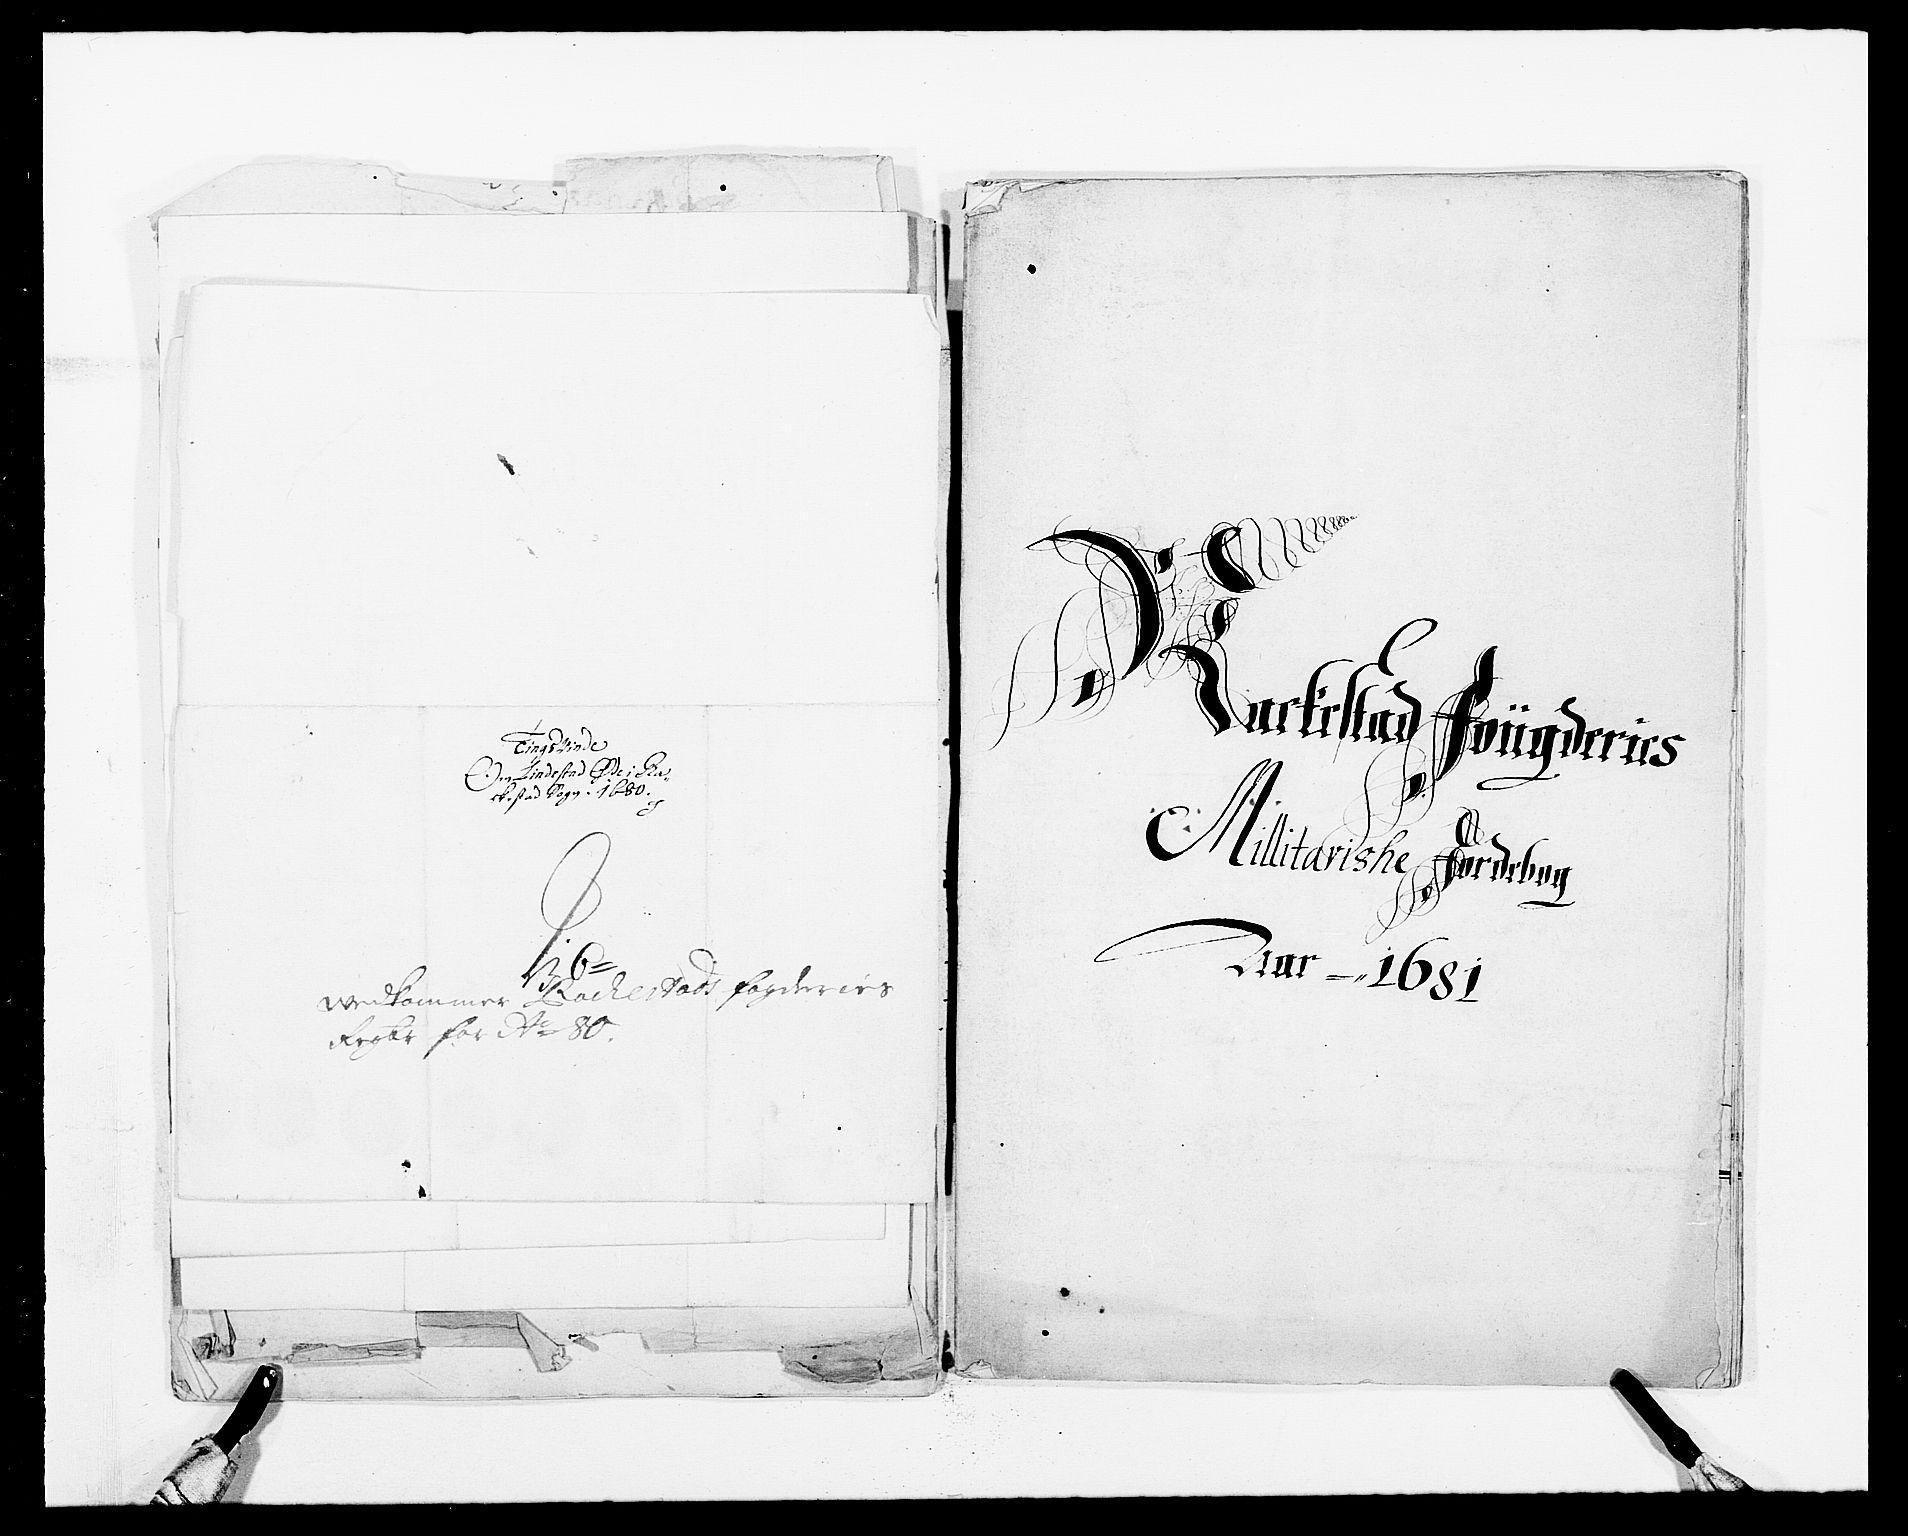 RA, Rentekammeret inntil 1814, Reviderte regnskaper, Fogderegnskap, R05/L0272: Fogderegnskap Rakkestad, 1680-1681, s. 421